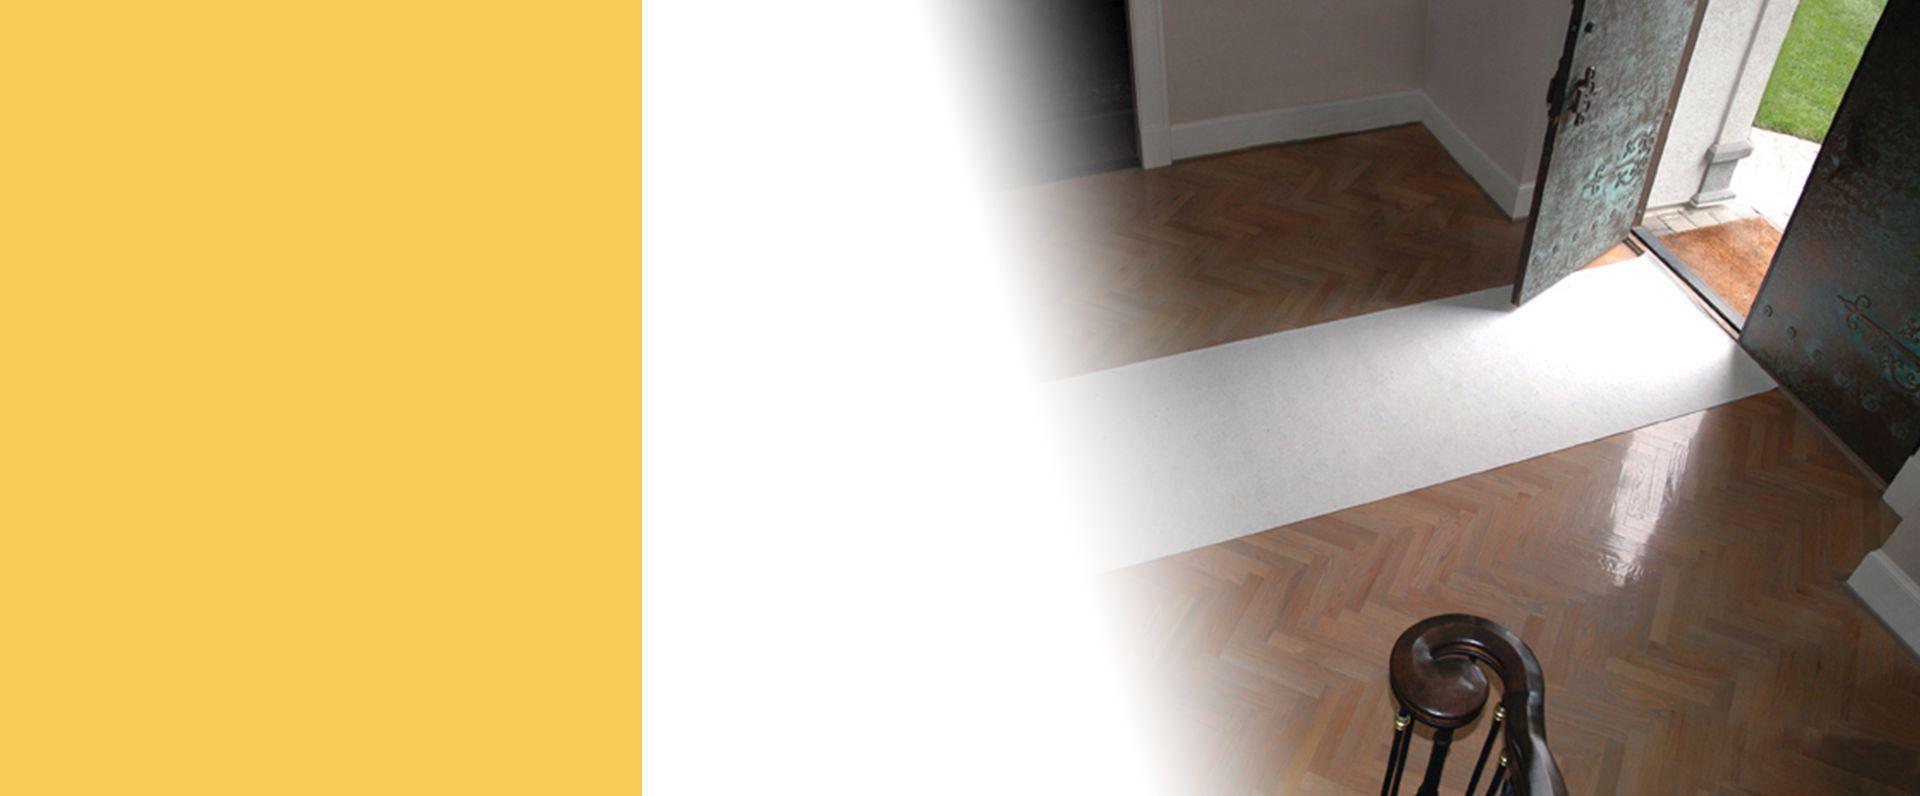 SurfacePro floor protection